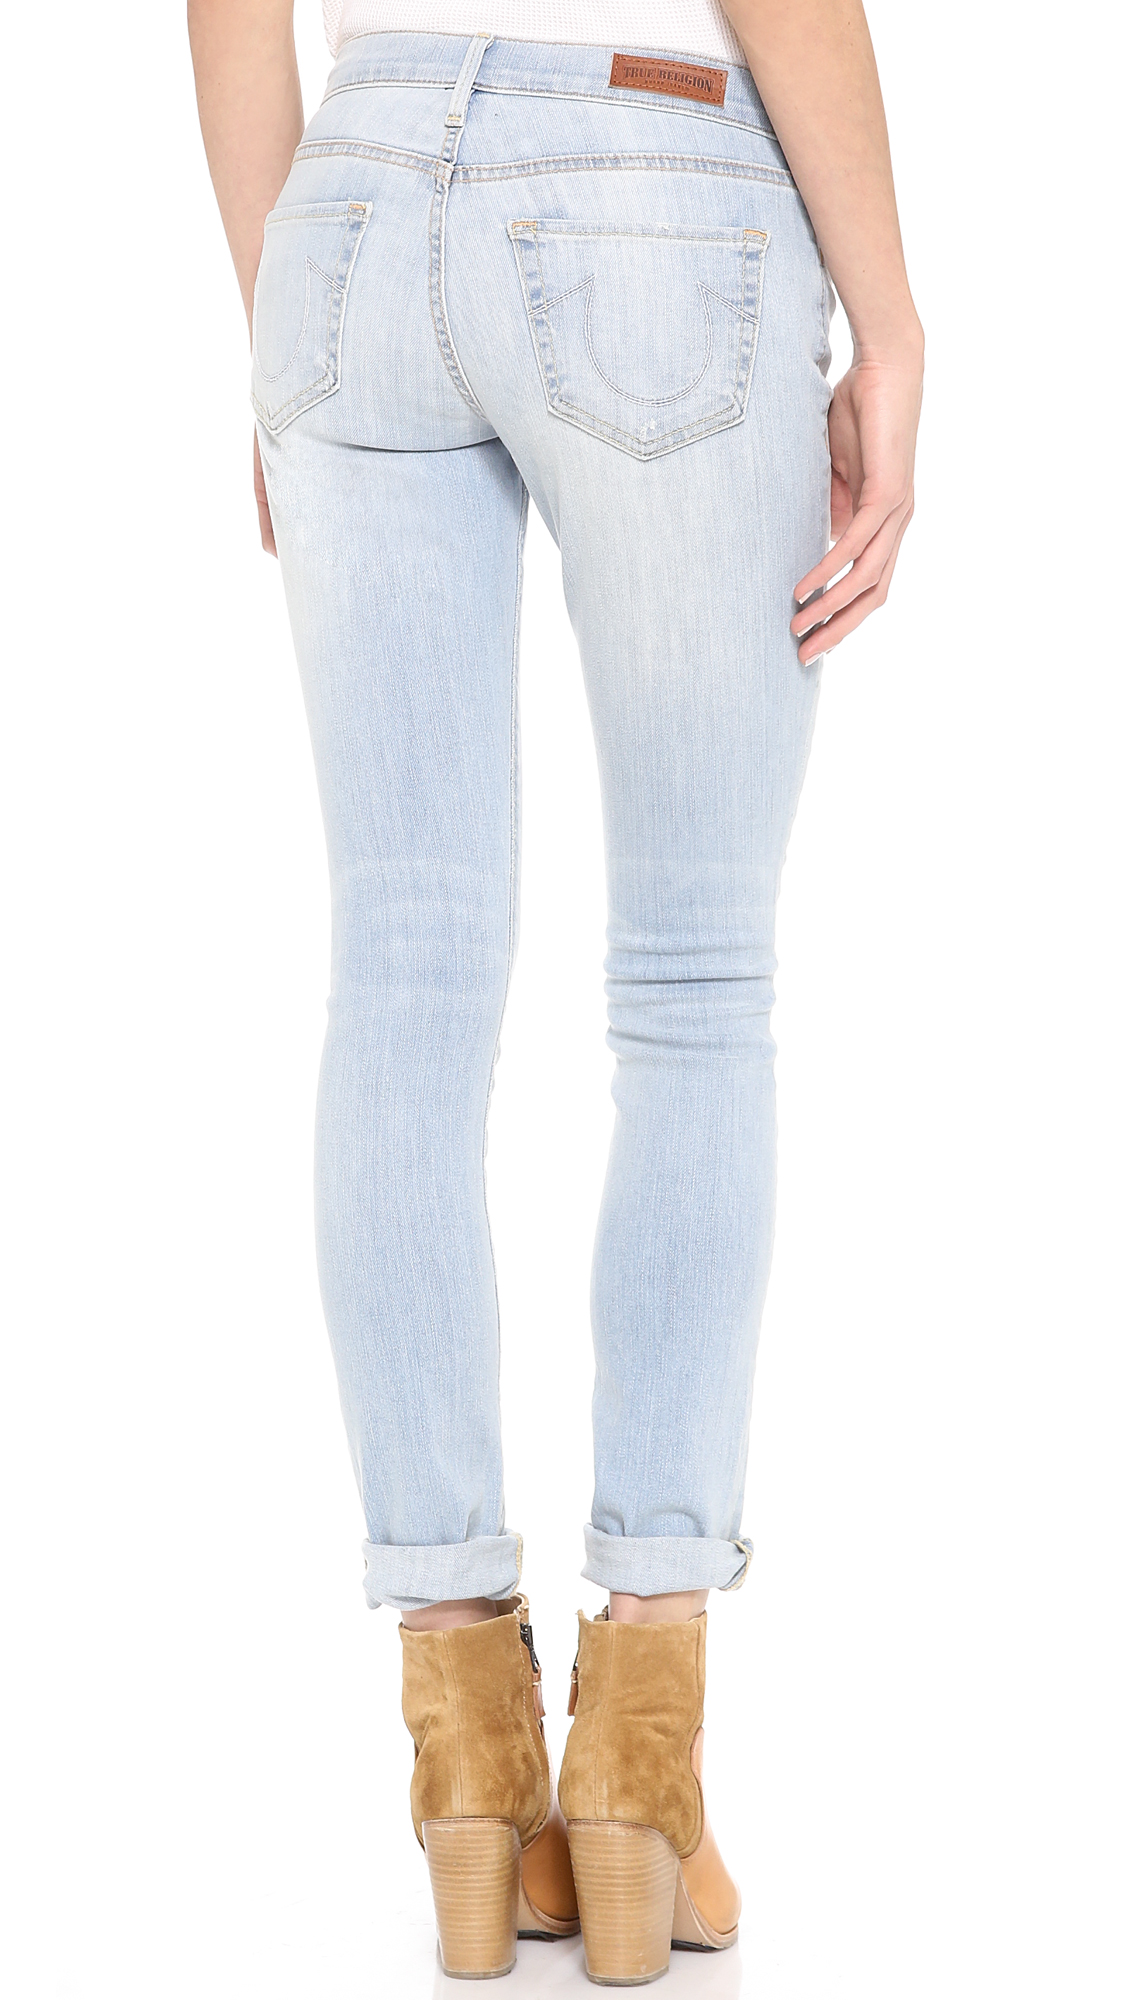 e043a59cb True Religion Halle Skinny Jeans